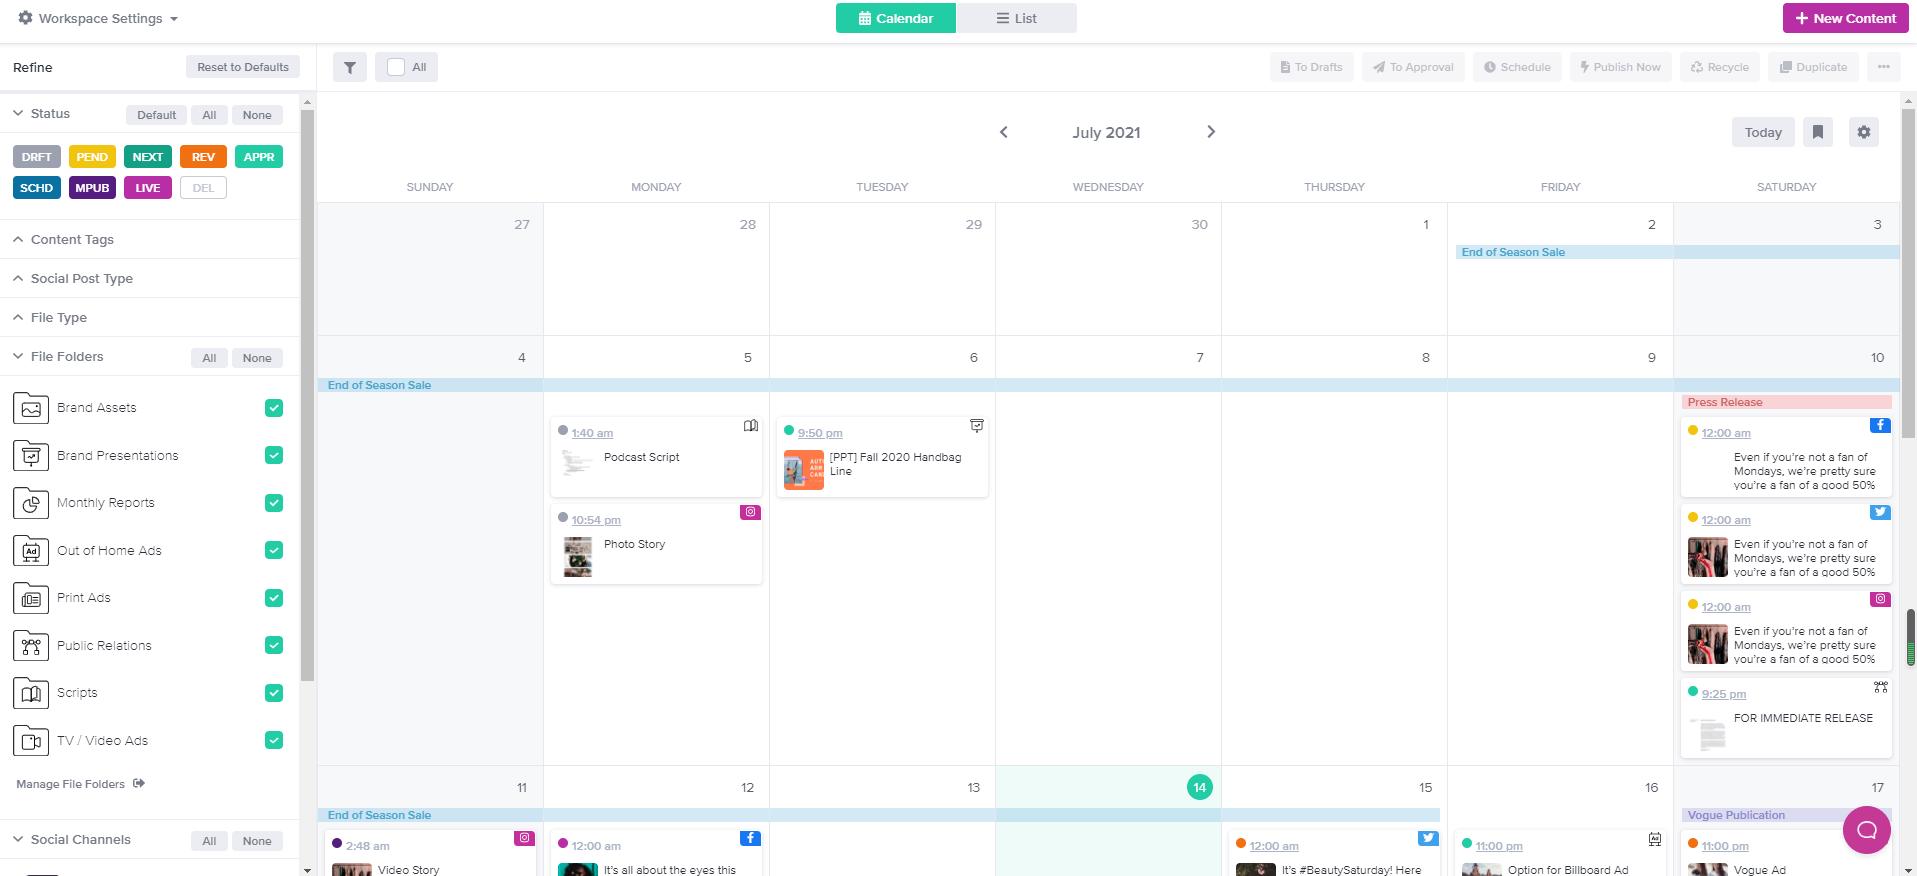 Gain Screenshot